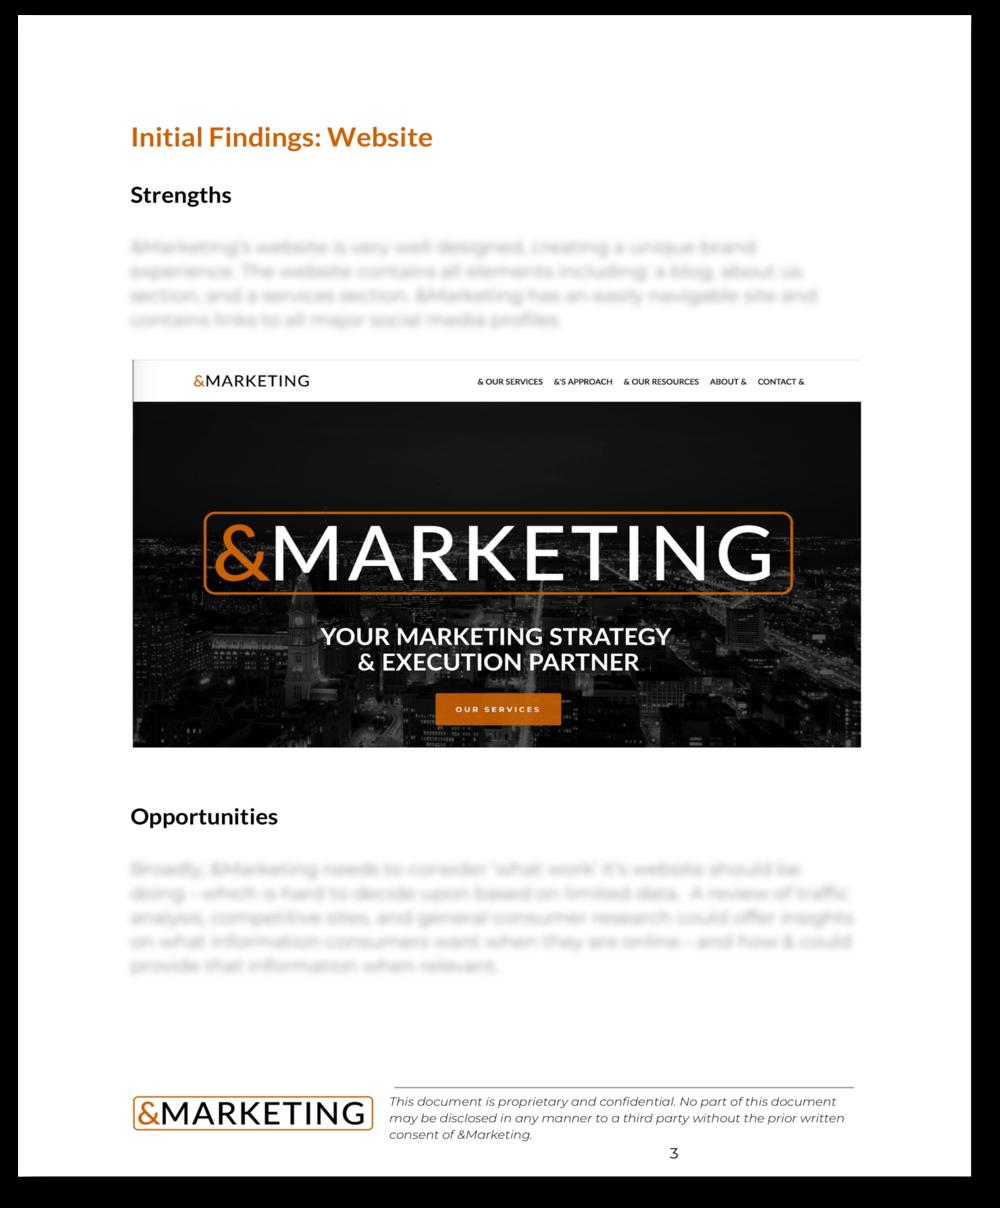 IMAwebsite.png